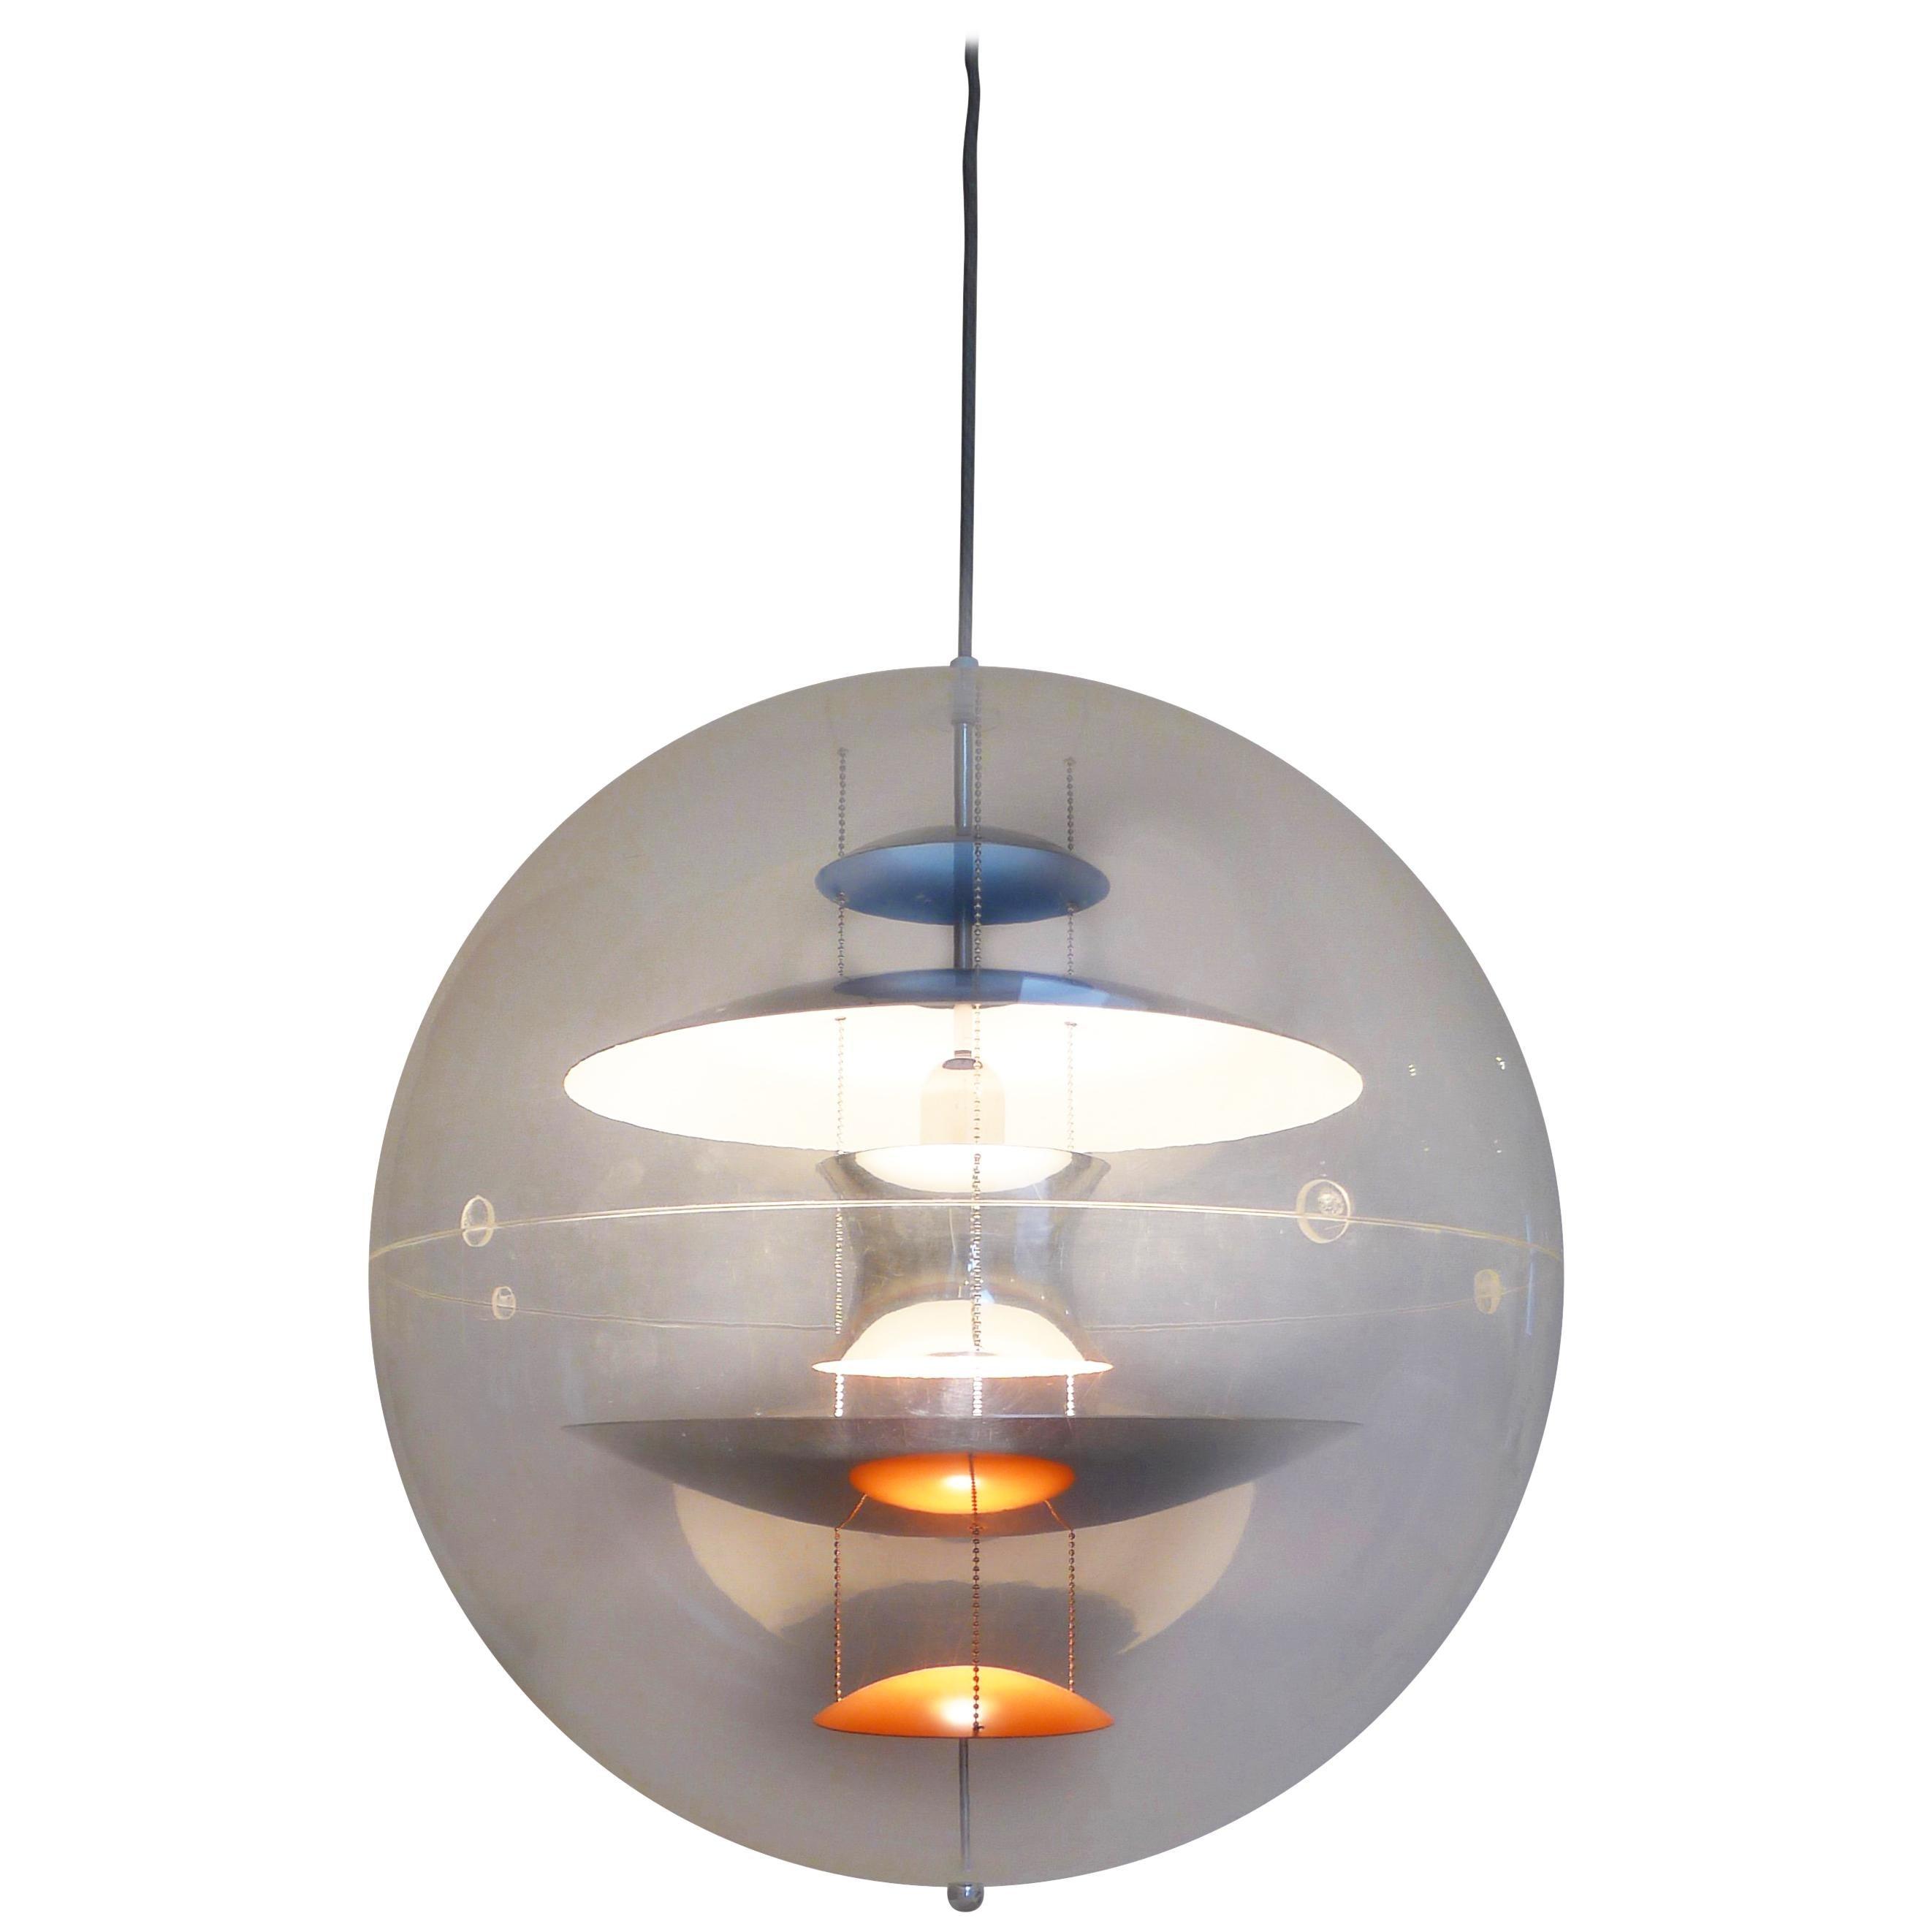 Verner panton lighting Design Danish Pinterest Verner Panton Lighting 118 For Sale At 1stdibs